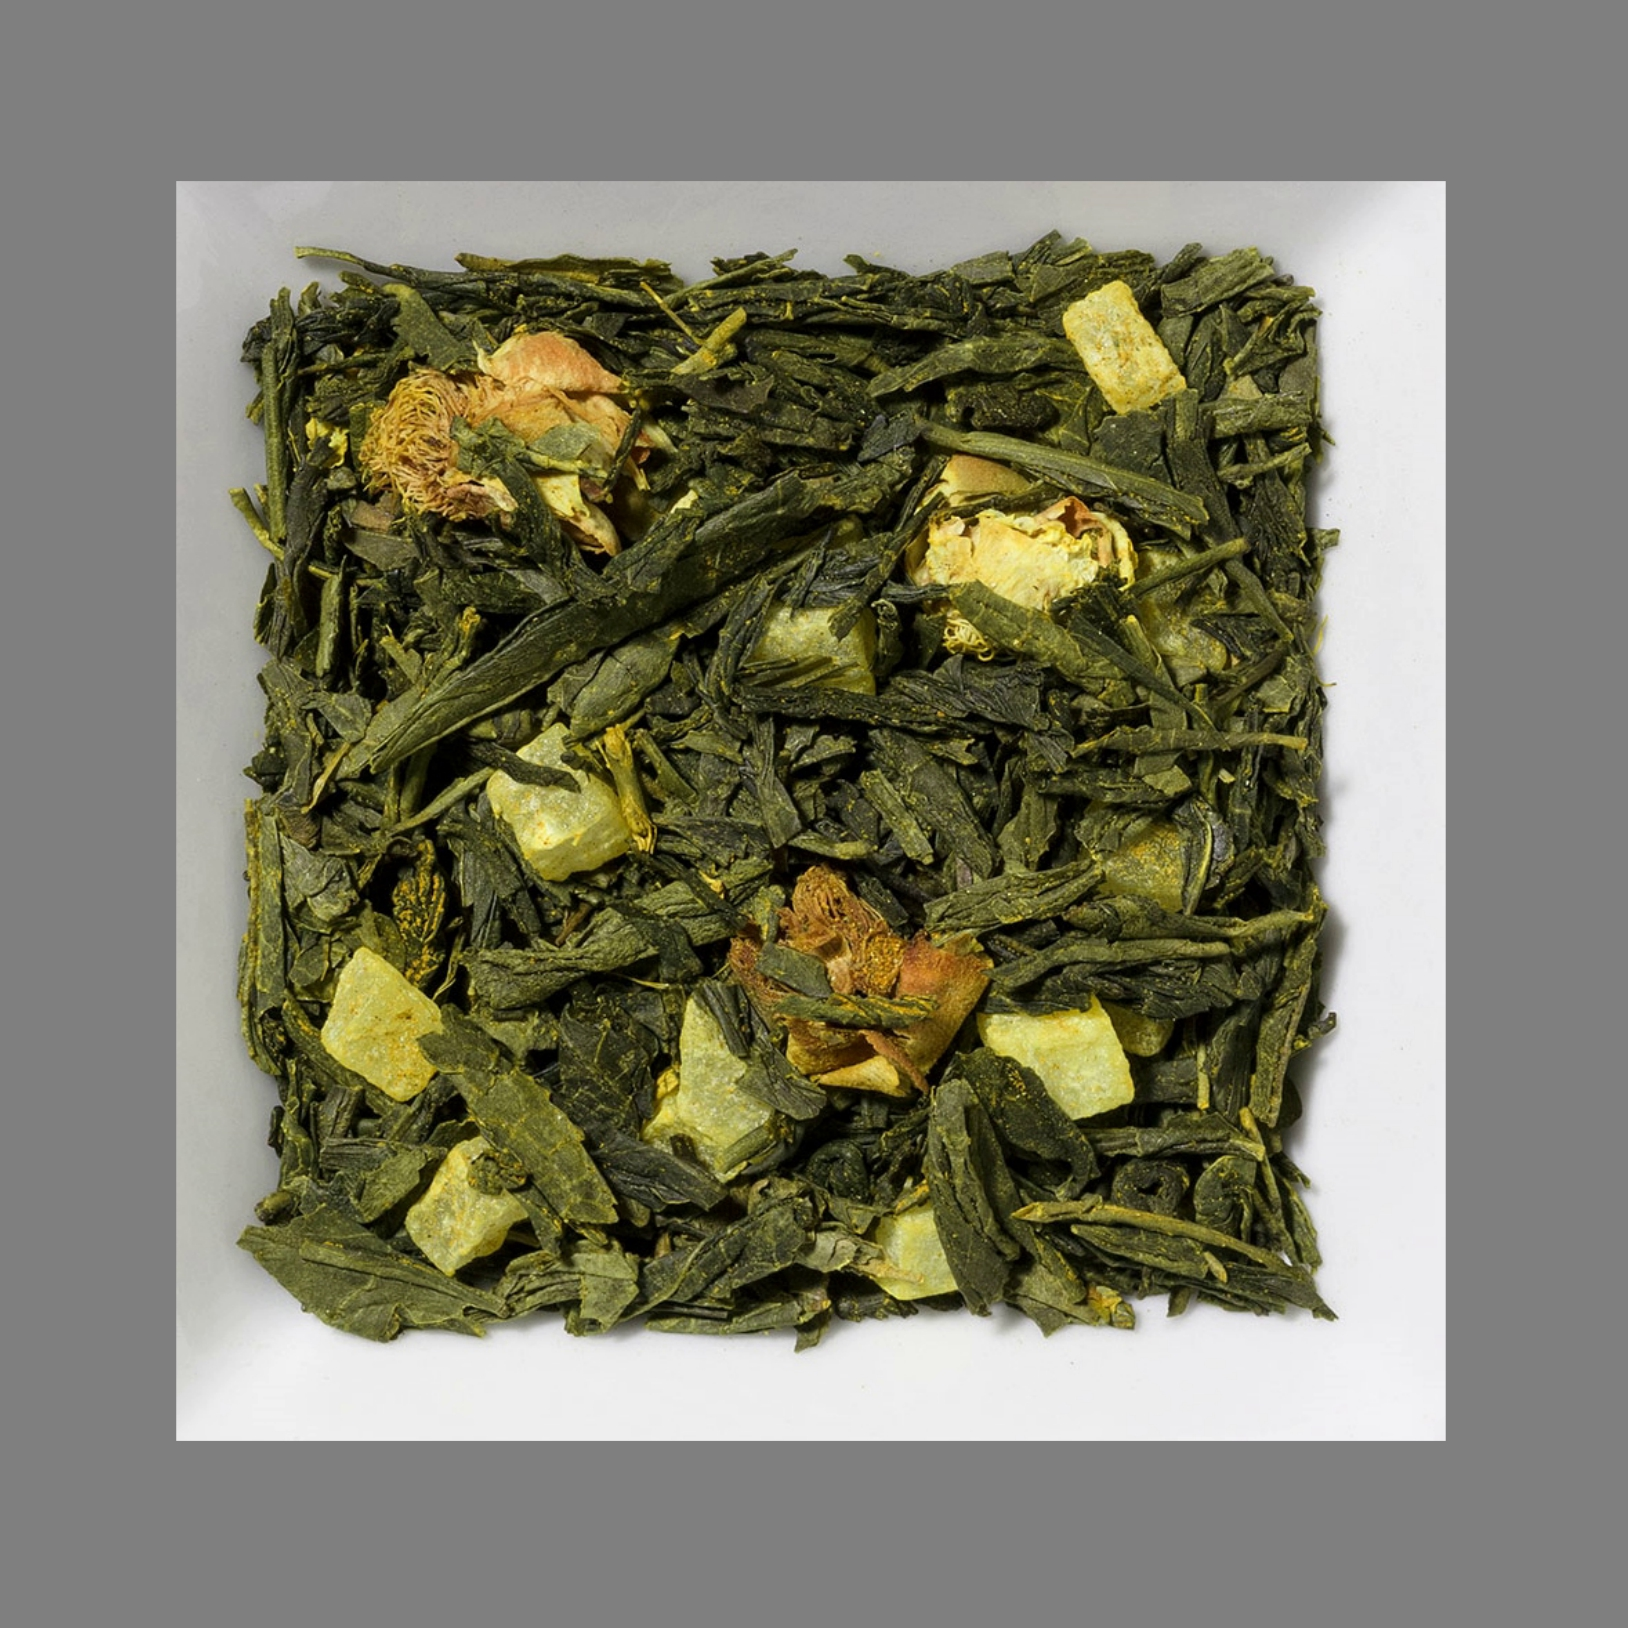 Kurkuma/Ananas aromatisierte Grüntee-/Früchtemischung